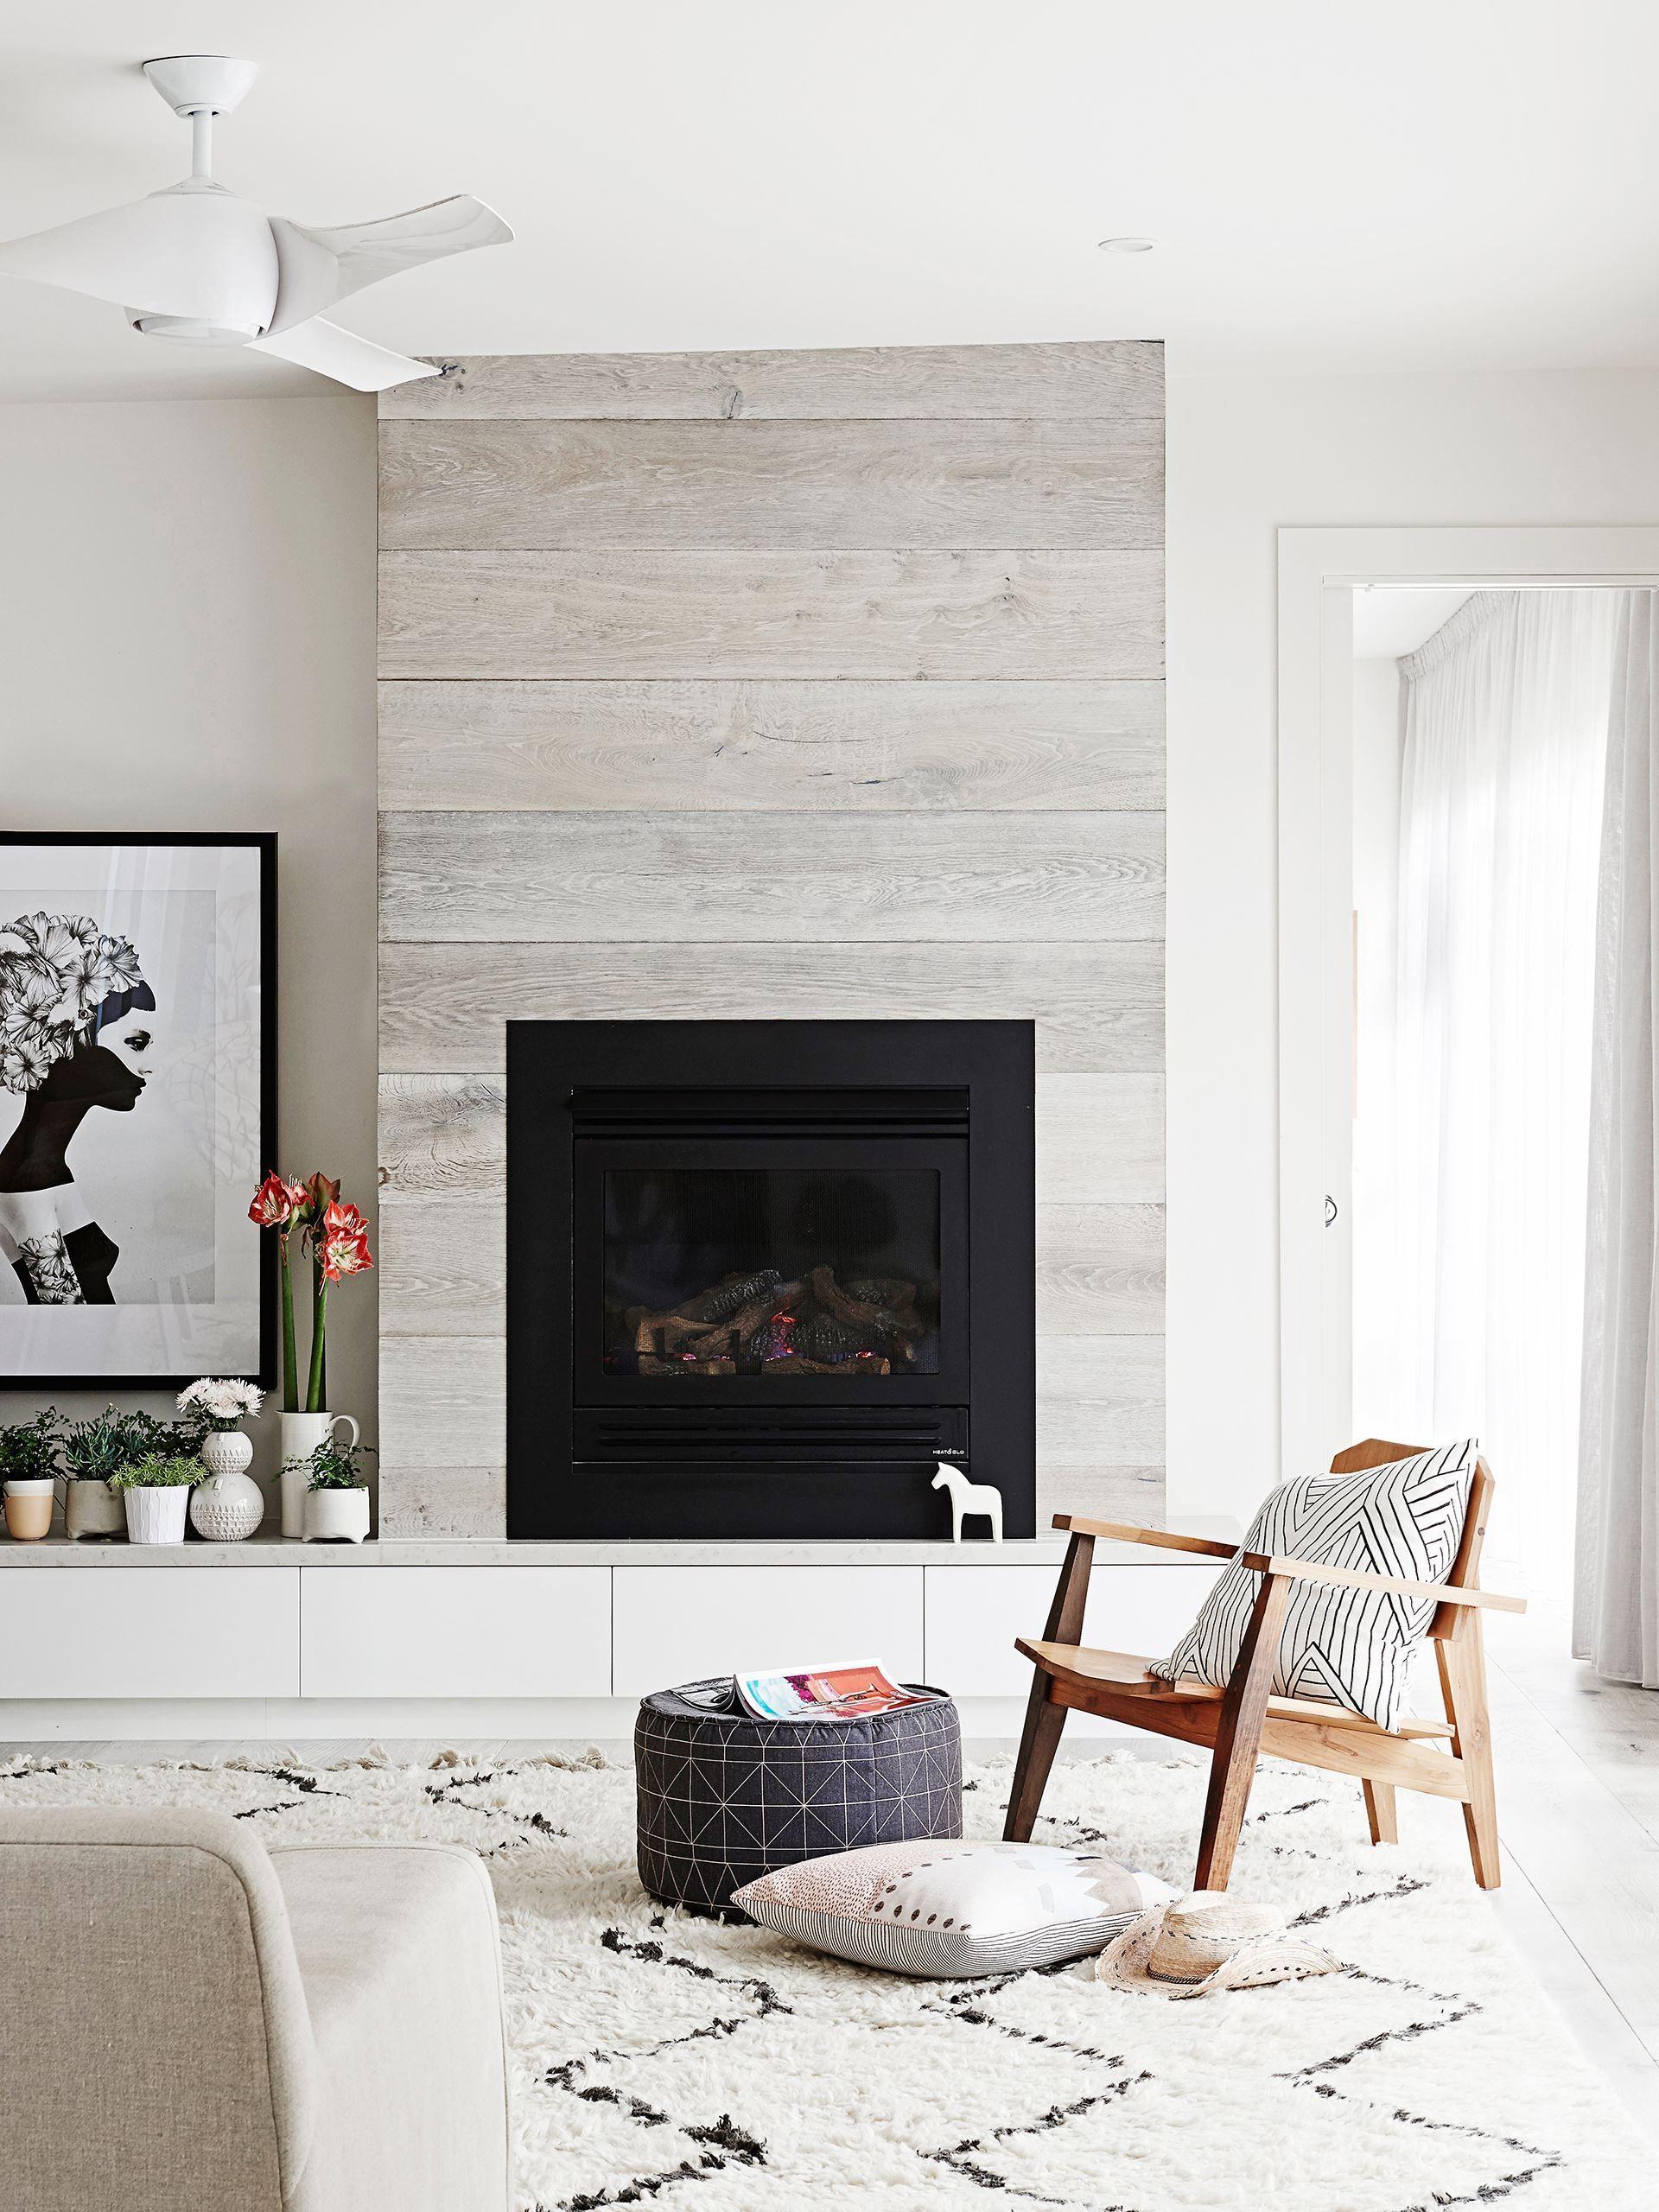 101 Reclaimed Wood Fireplace Surround Ideas | Pinterest | Reclaimed ...